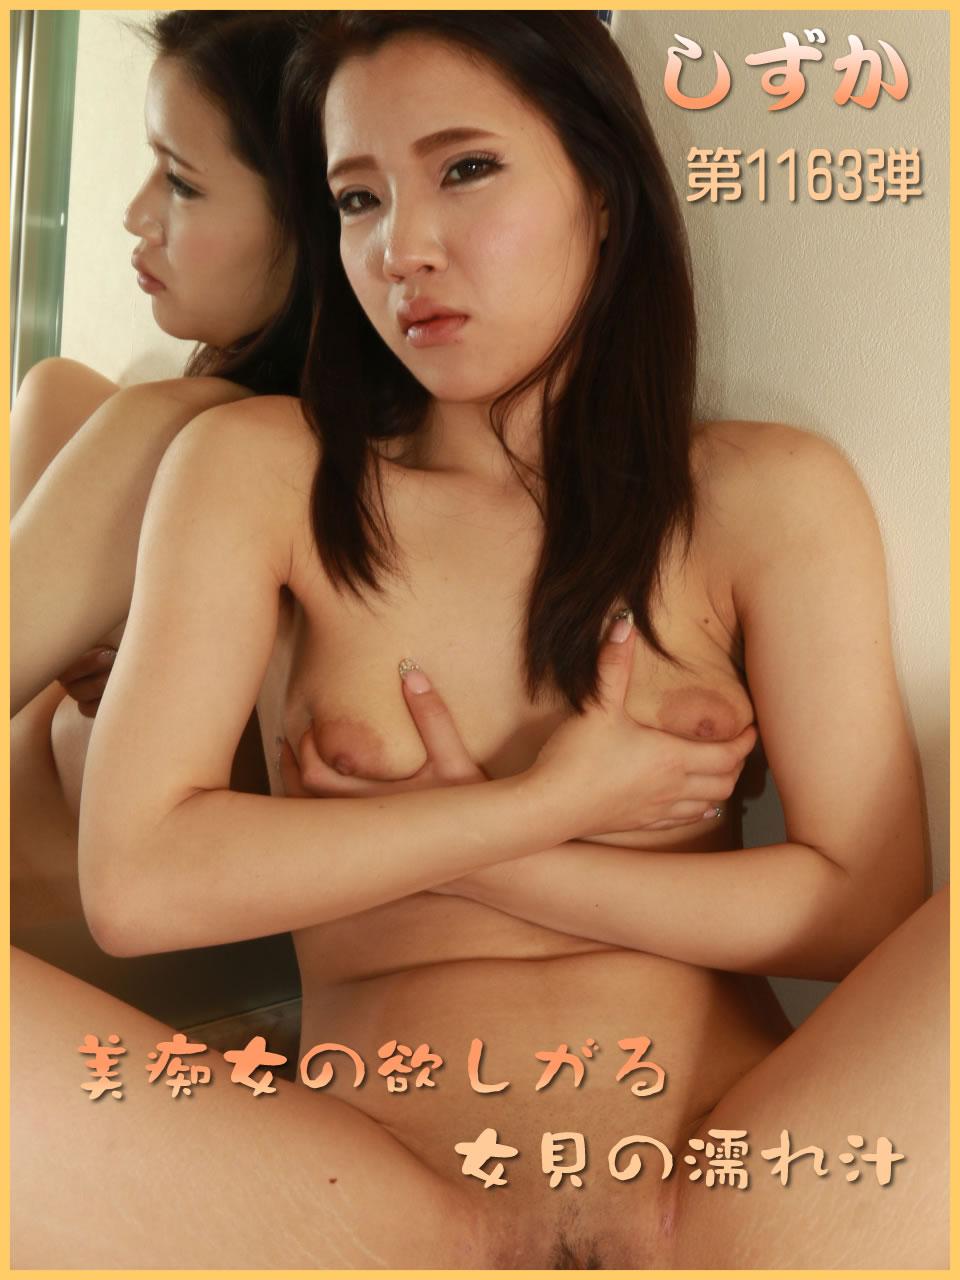 pacificgirls 1163 PacificGirls – 2017-06-28 [003170 しずか] Shizuka – Set 第 ...